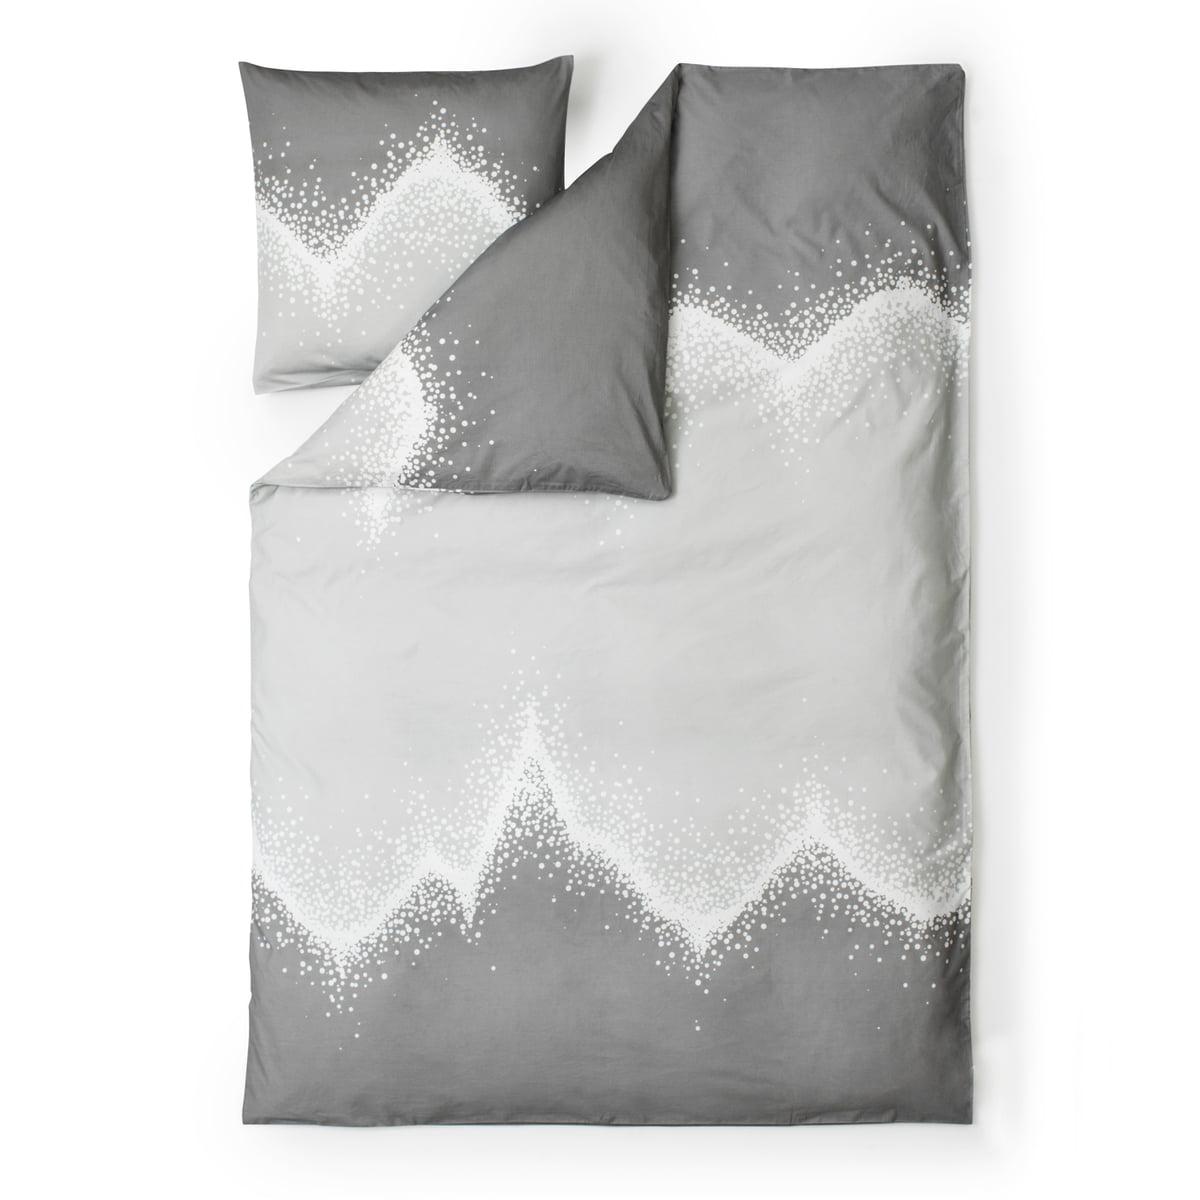 normann copenhagen sengetøj Sprinkle sengetøj fra Normann Copenhagen normann copenhagen sengetøj